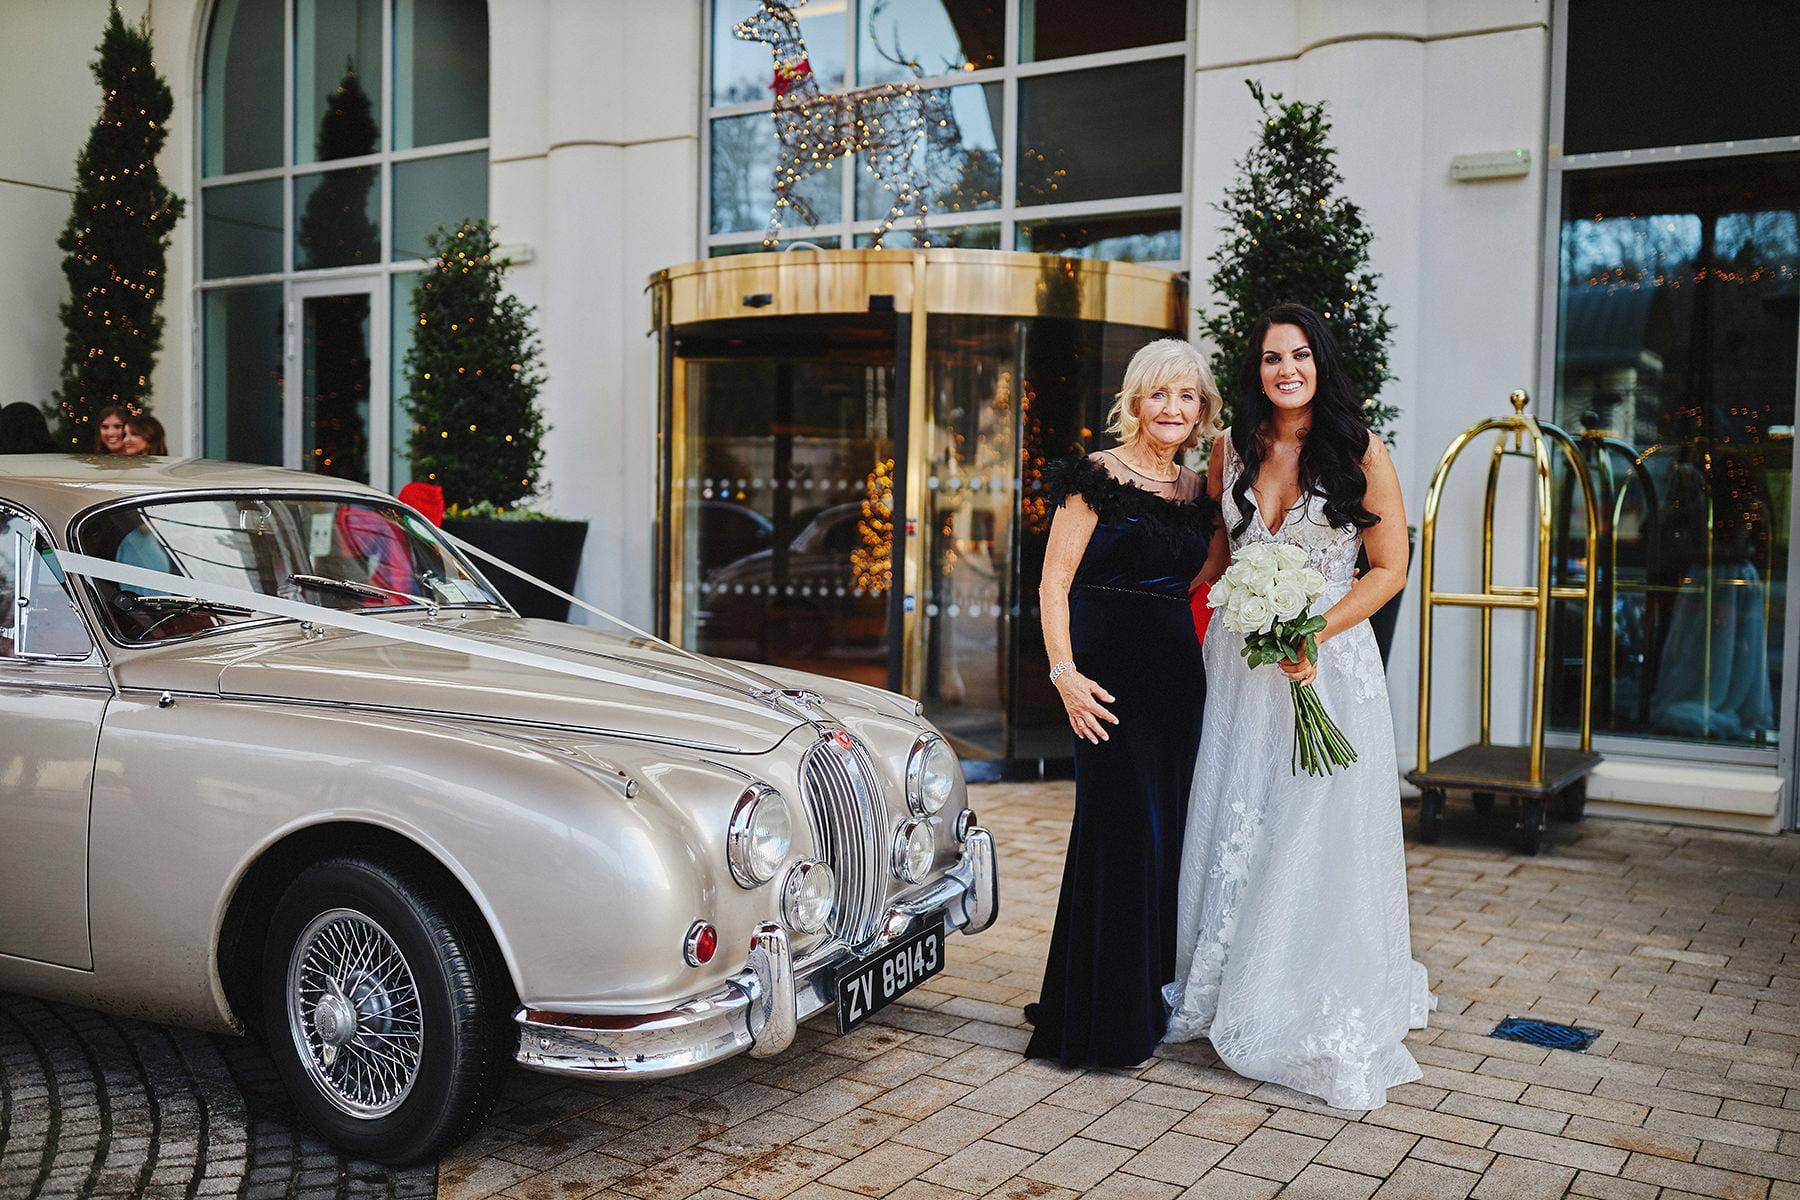 POWERSCOURT HOTEL RESORT INTIMATE WEDDING 35